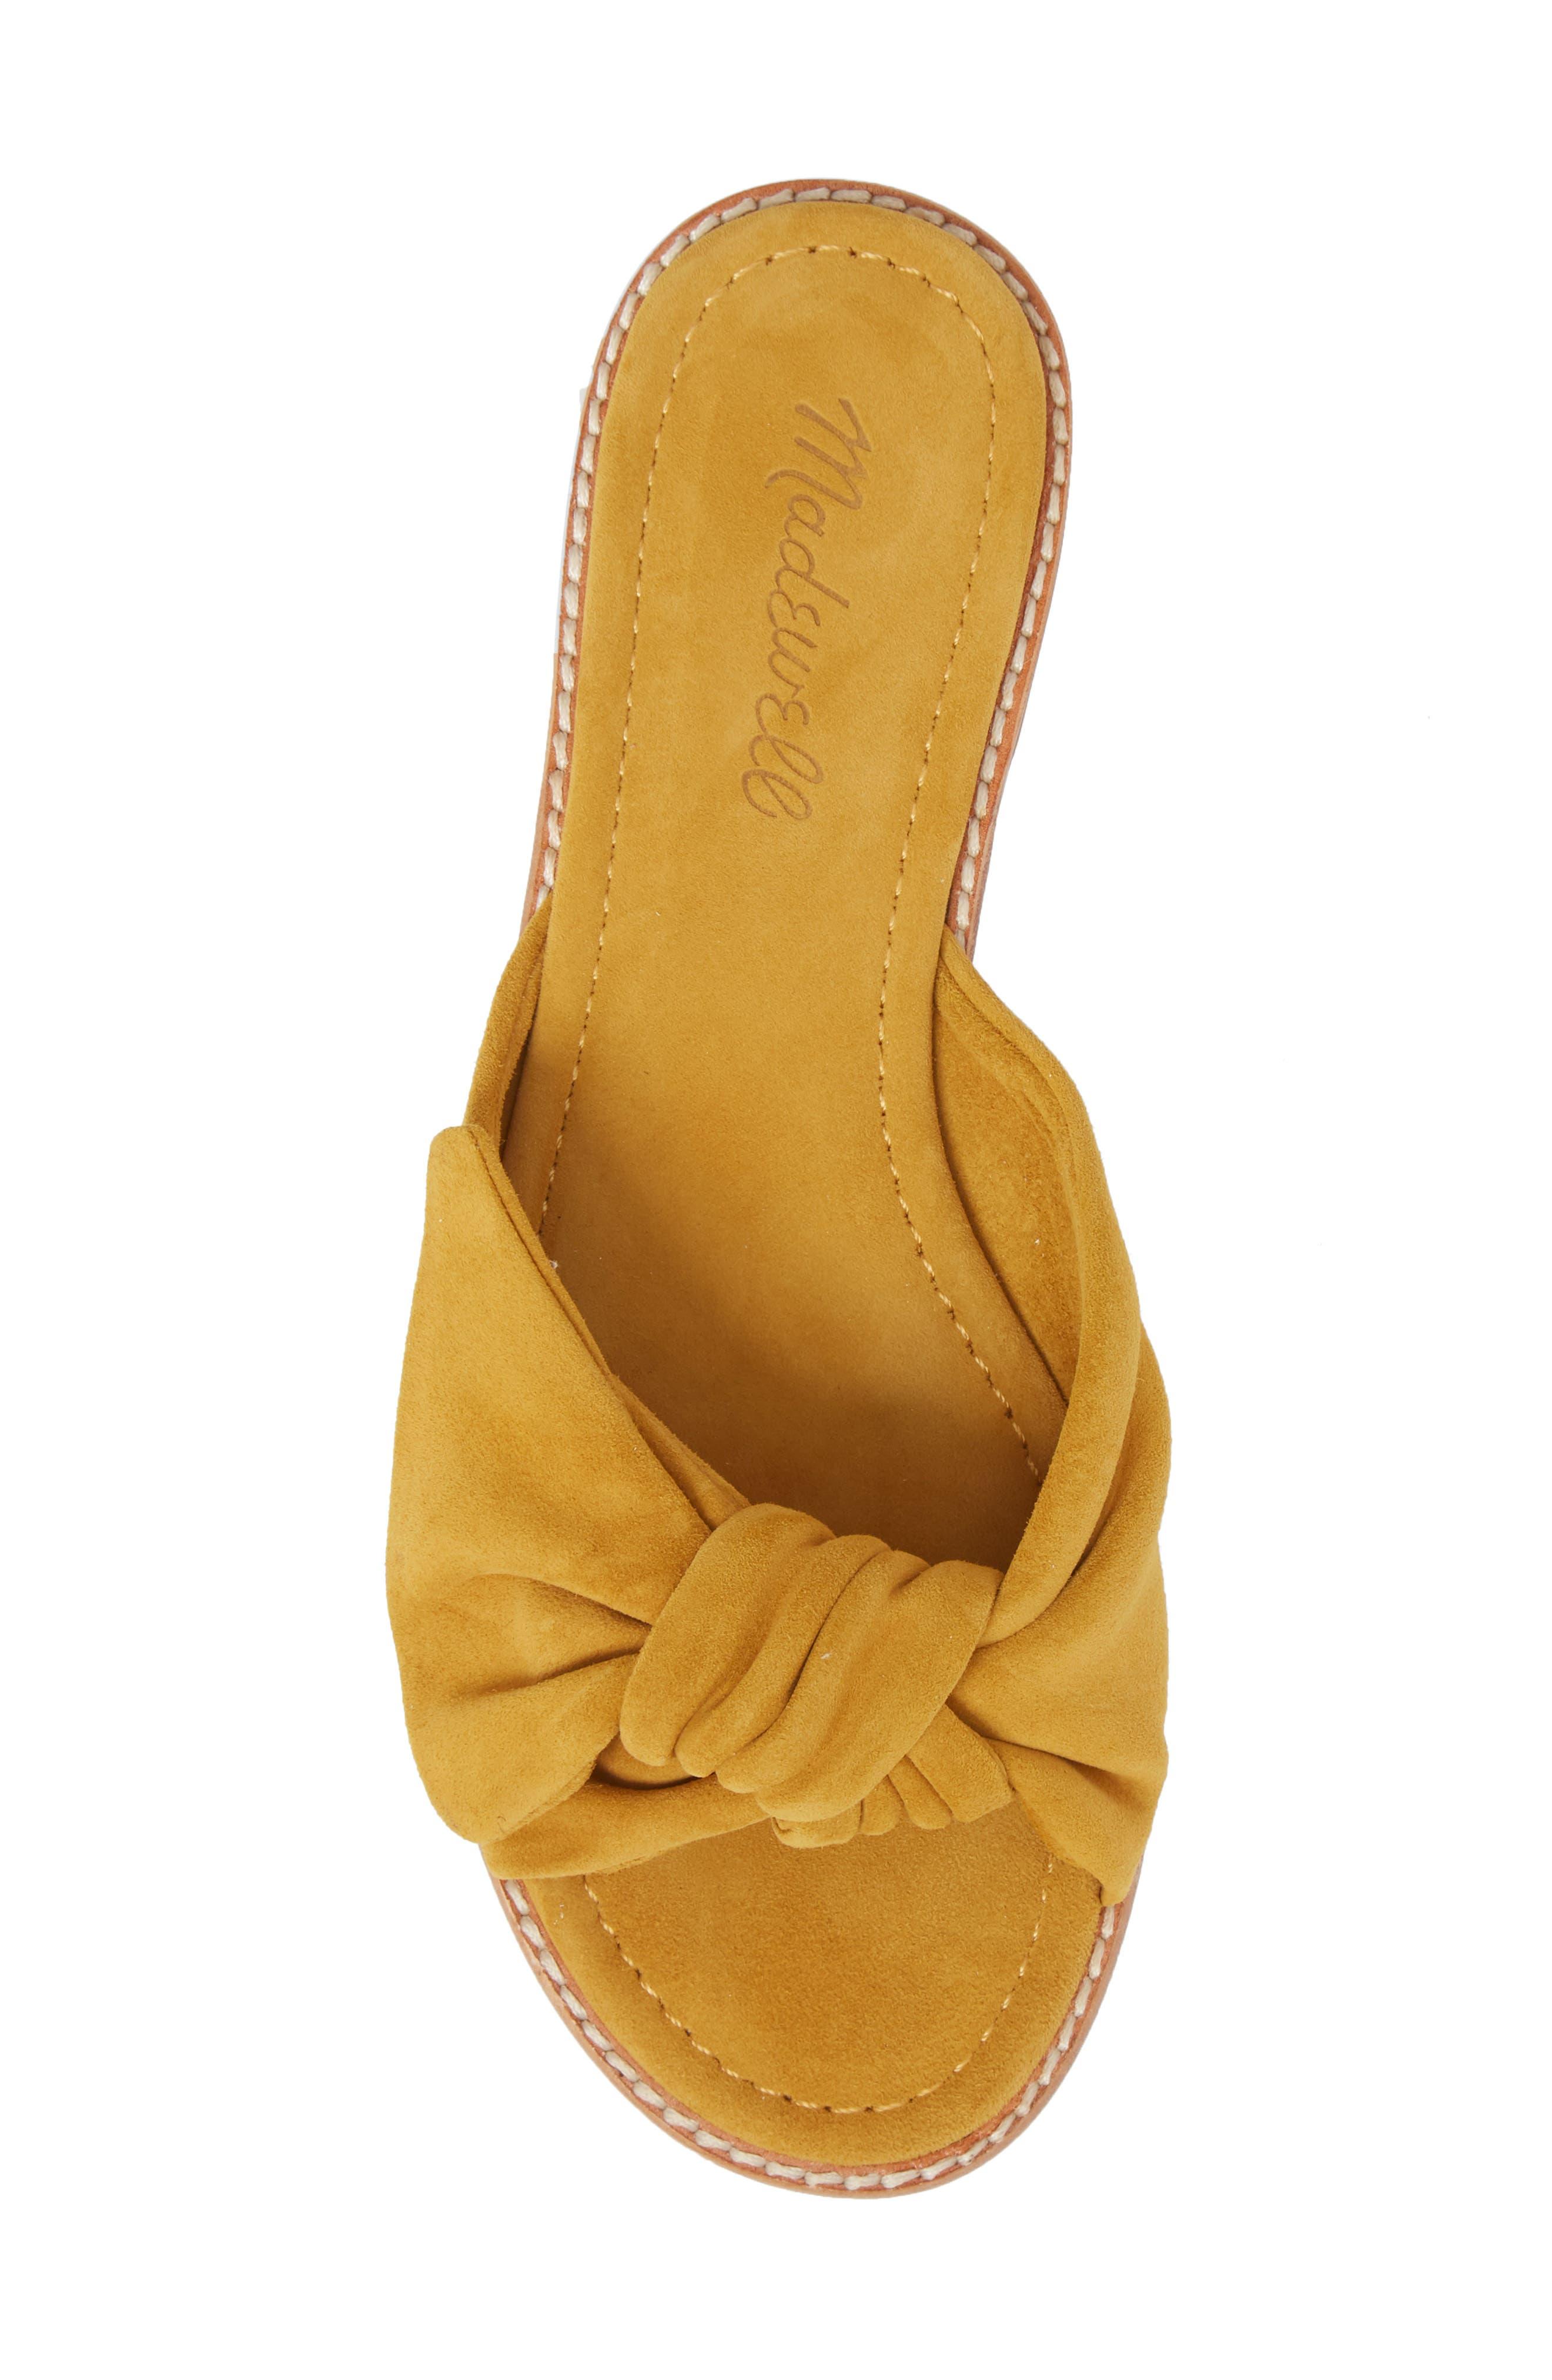 Naida Slide Sandal,                             Alternate thumbnail 5, color,                             Cider Leather